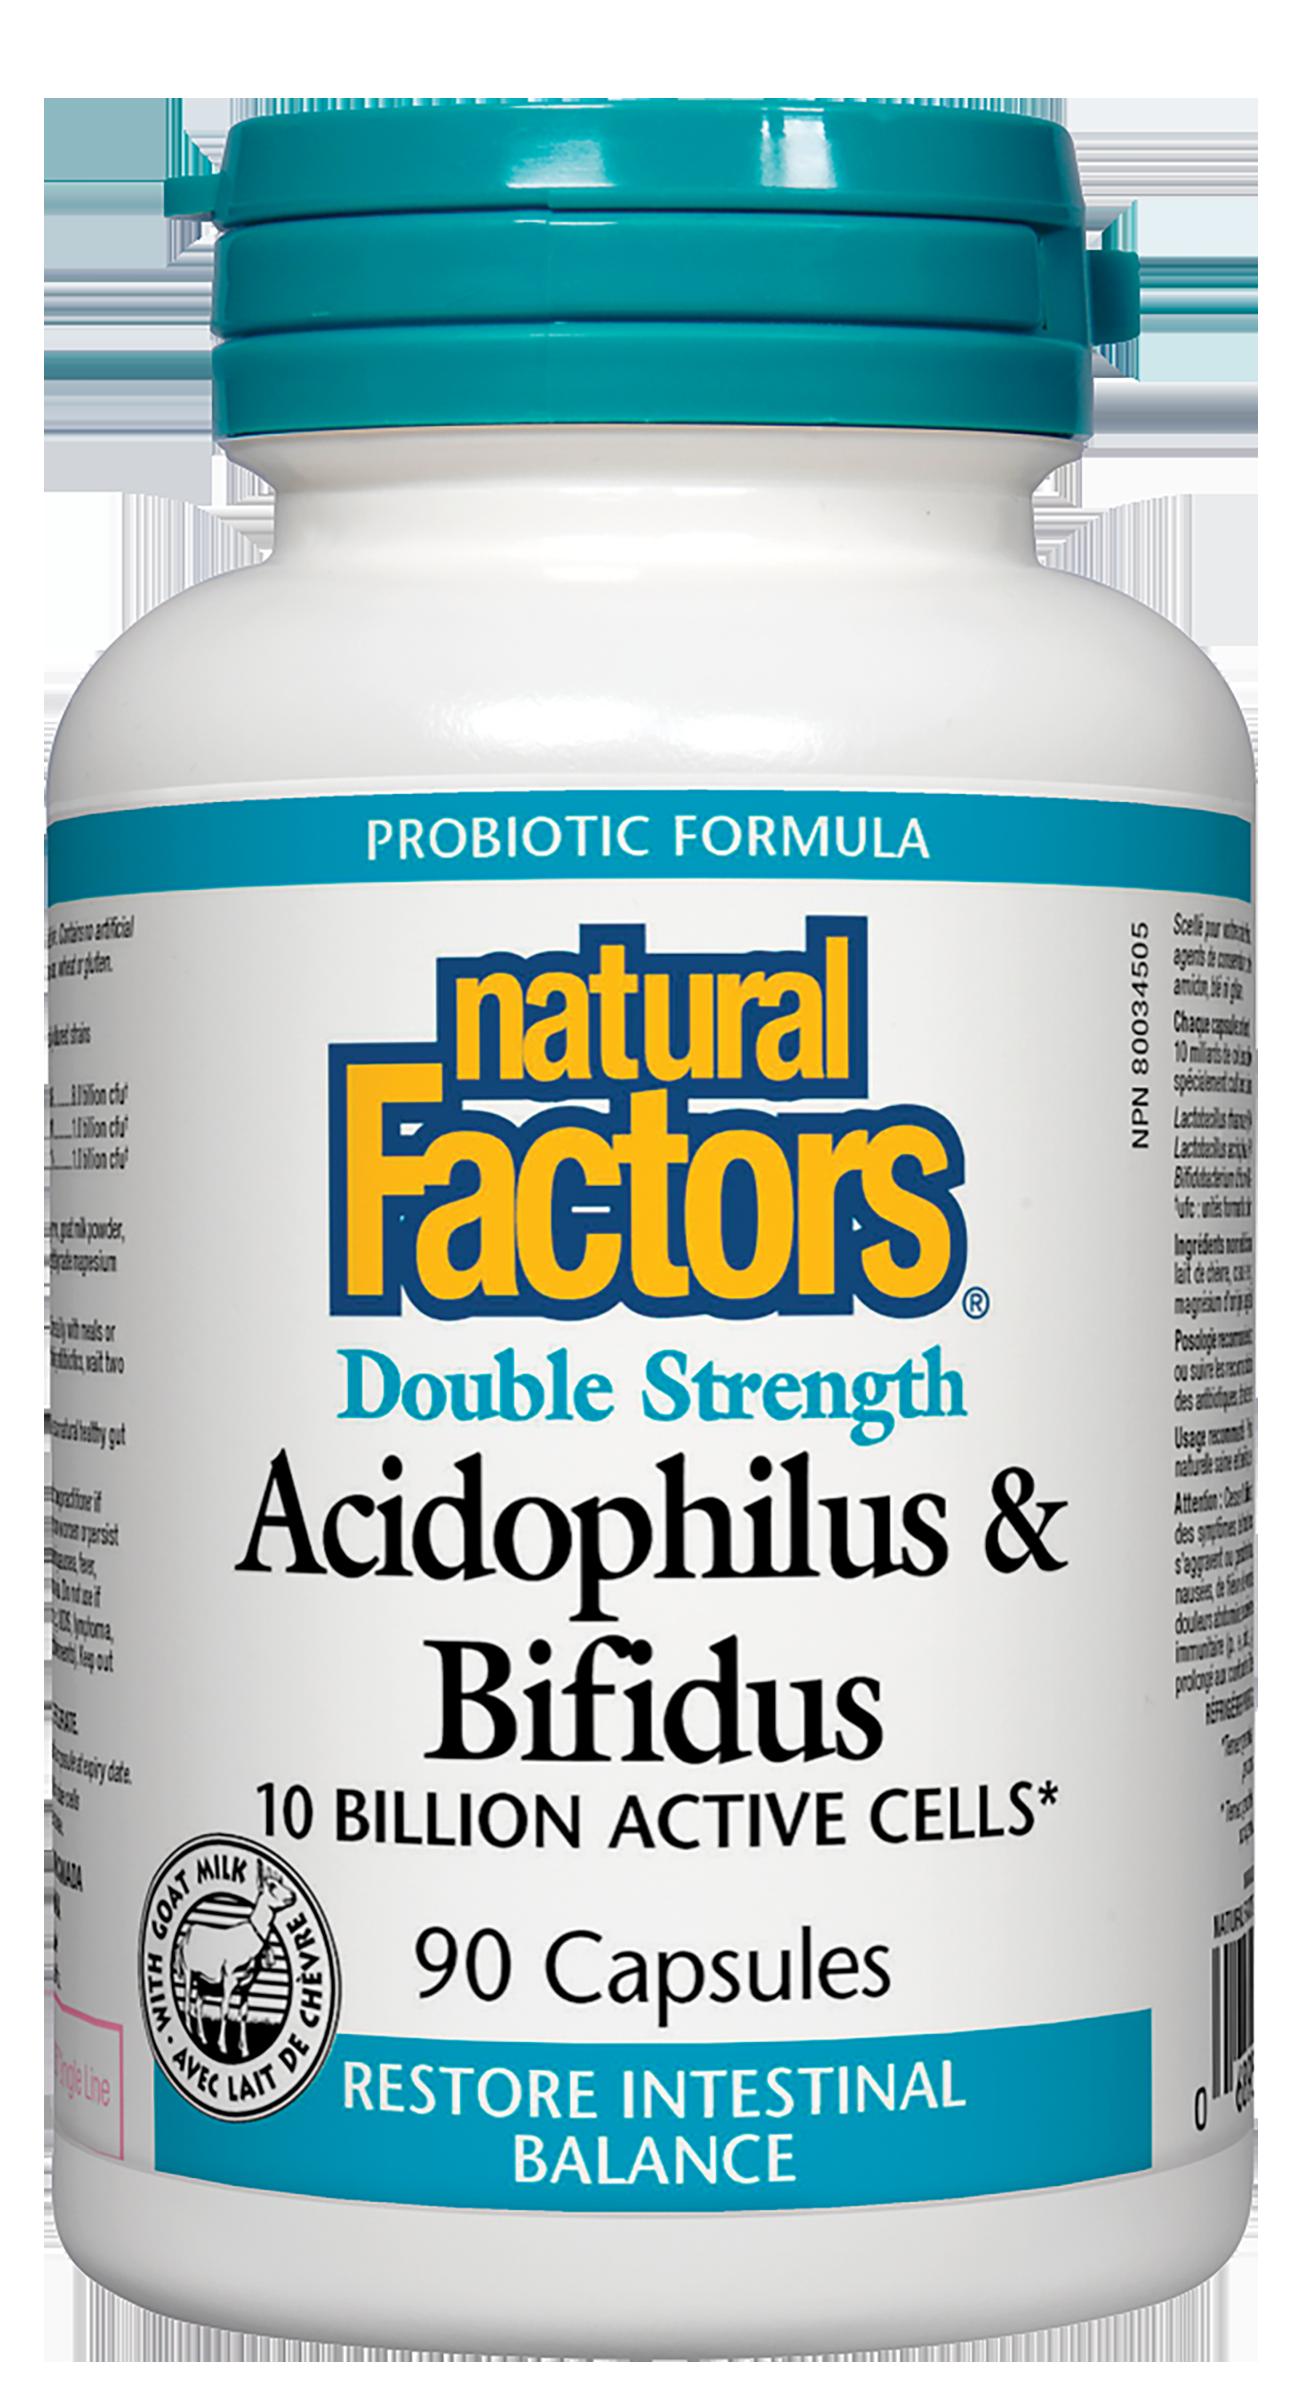 Acidophilus & Bifidus Double Strength 10 Billion Active Cells 90 Capsules